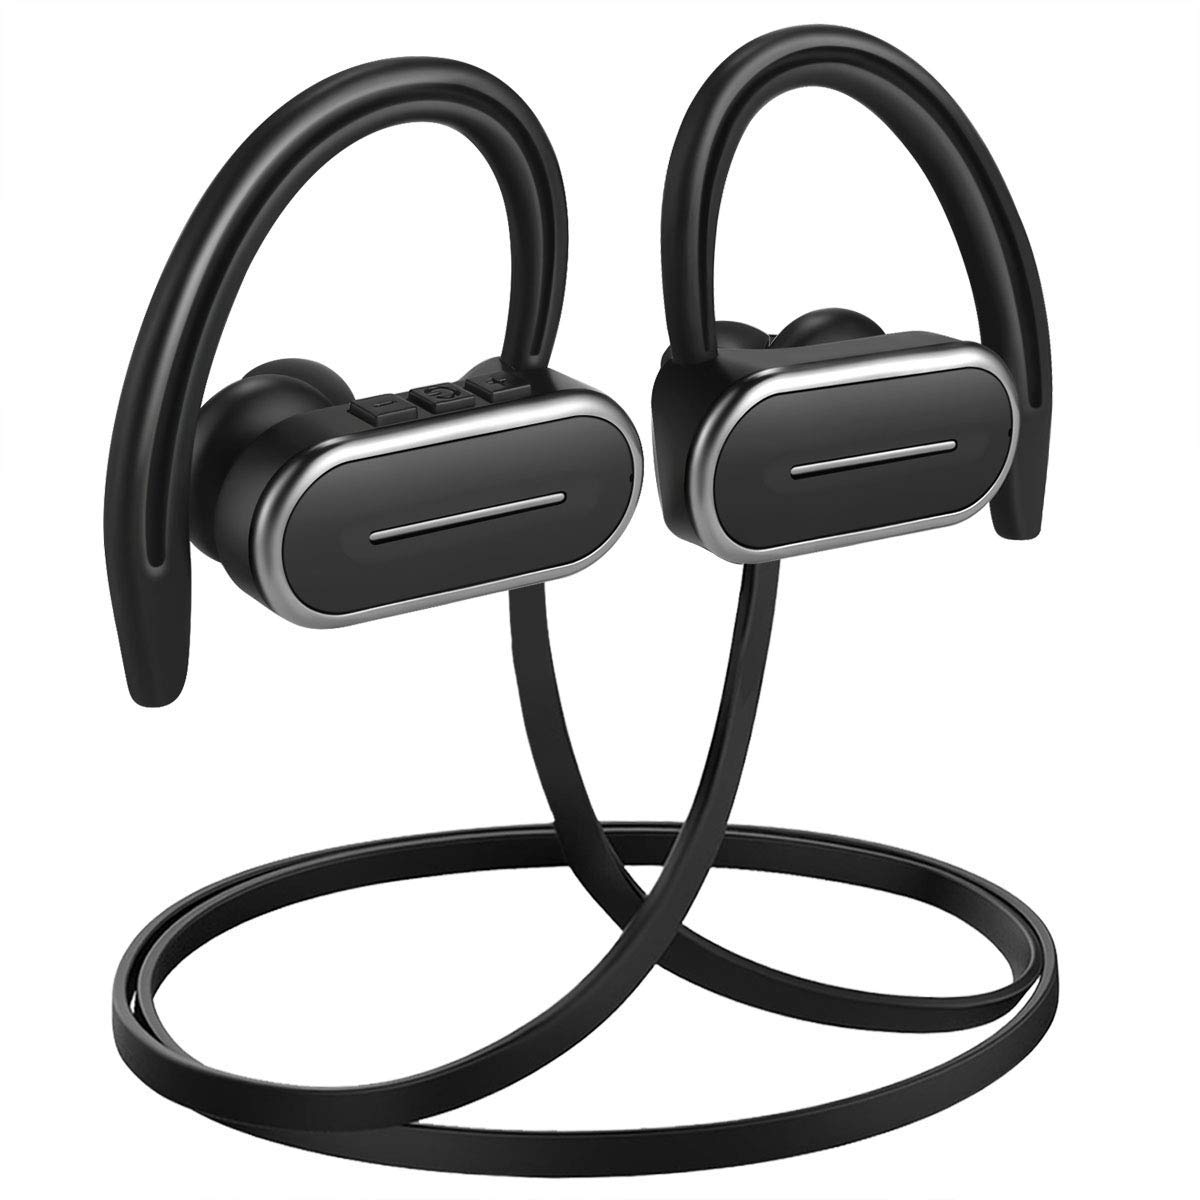 yobola MP3 Palyer Bluetooth Headphones, Wireless In Ear Sports Bluetooth Headphones Sweatproof Earphones